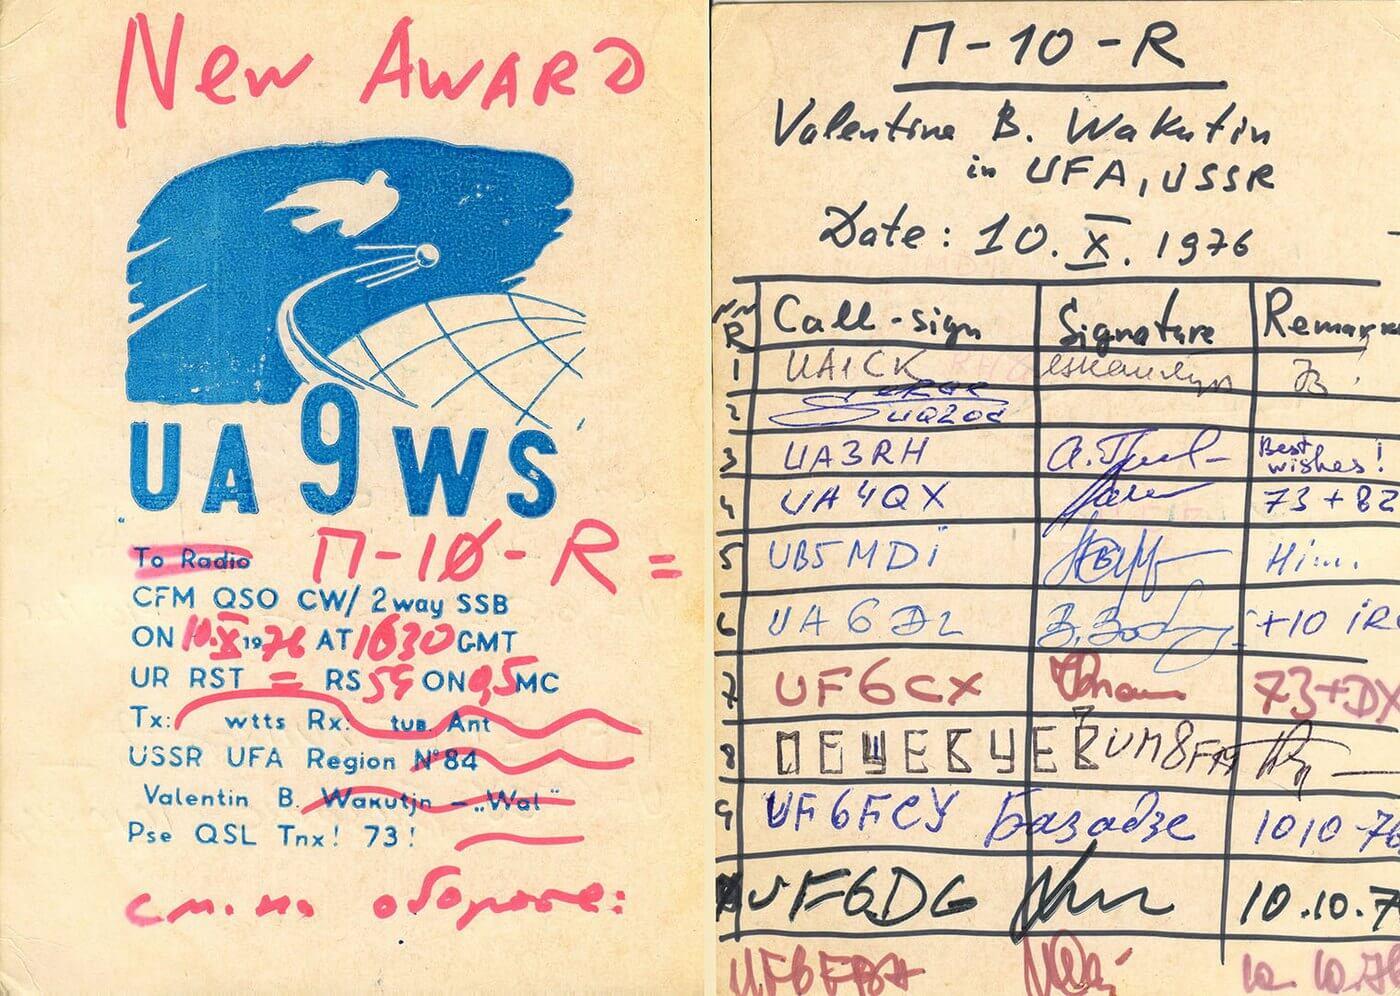 Нажмите на изображение для увеличения.  Название:UA9WS-QSL-1976.jpg Просмотров:10 Размер:236.2 Кб ID:193564